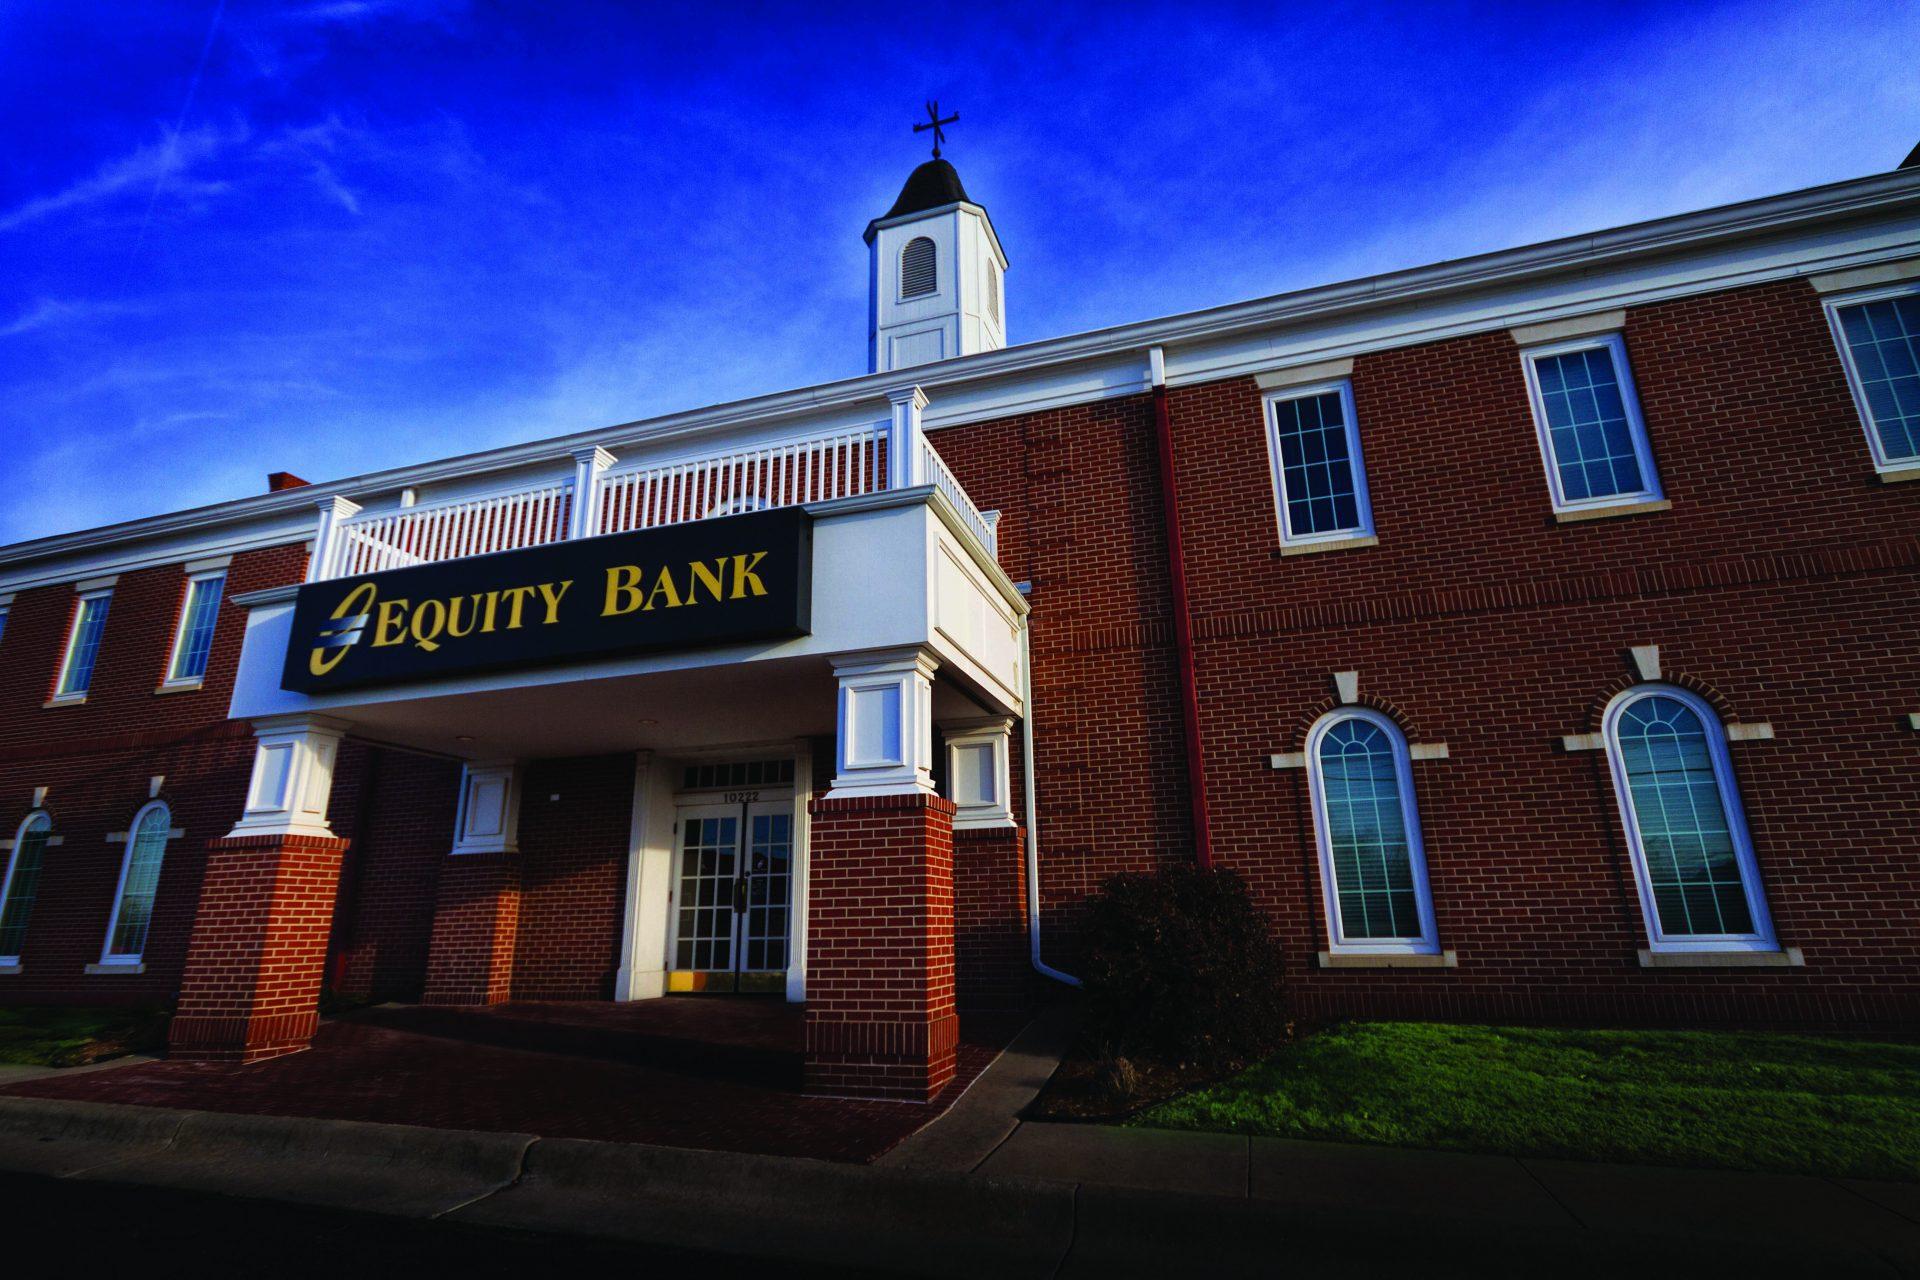 Equity Bank Wichita West branch exterior.